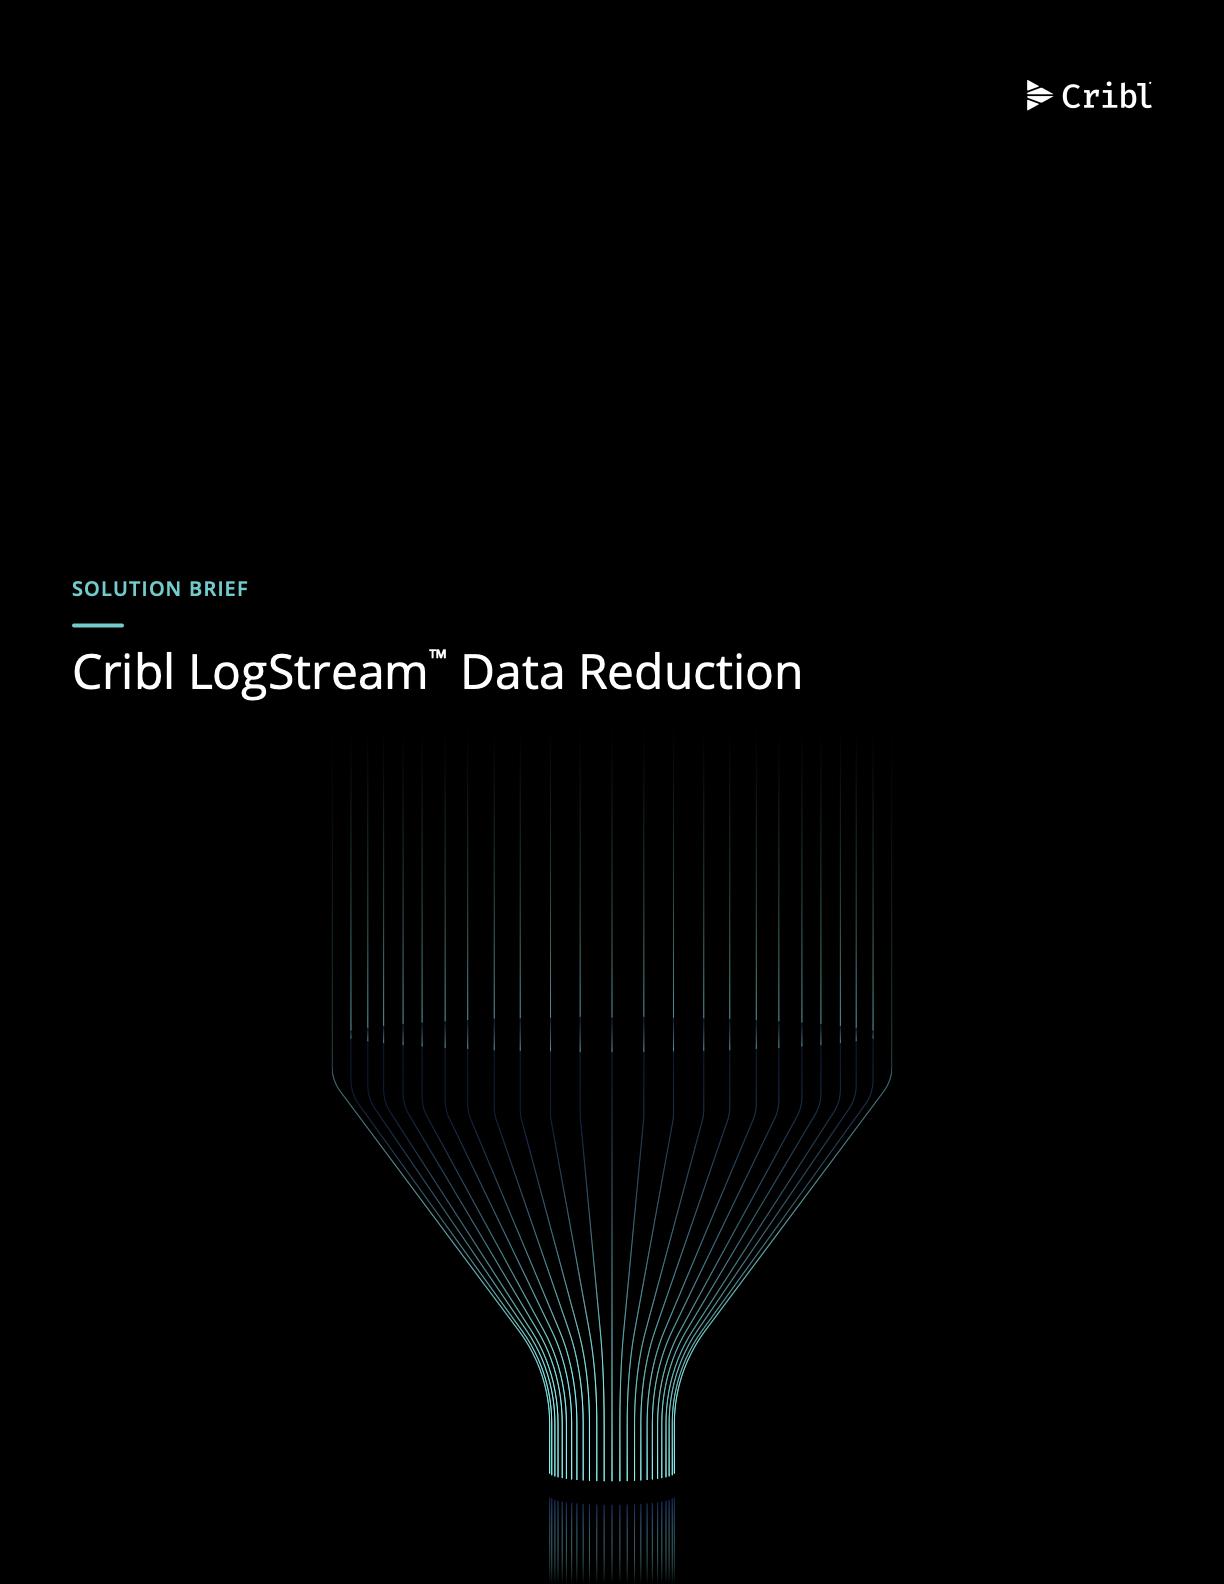 LogStream Data Reduction